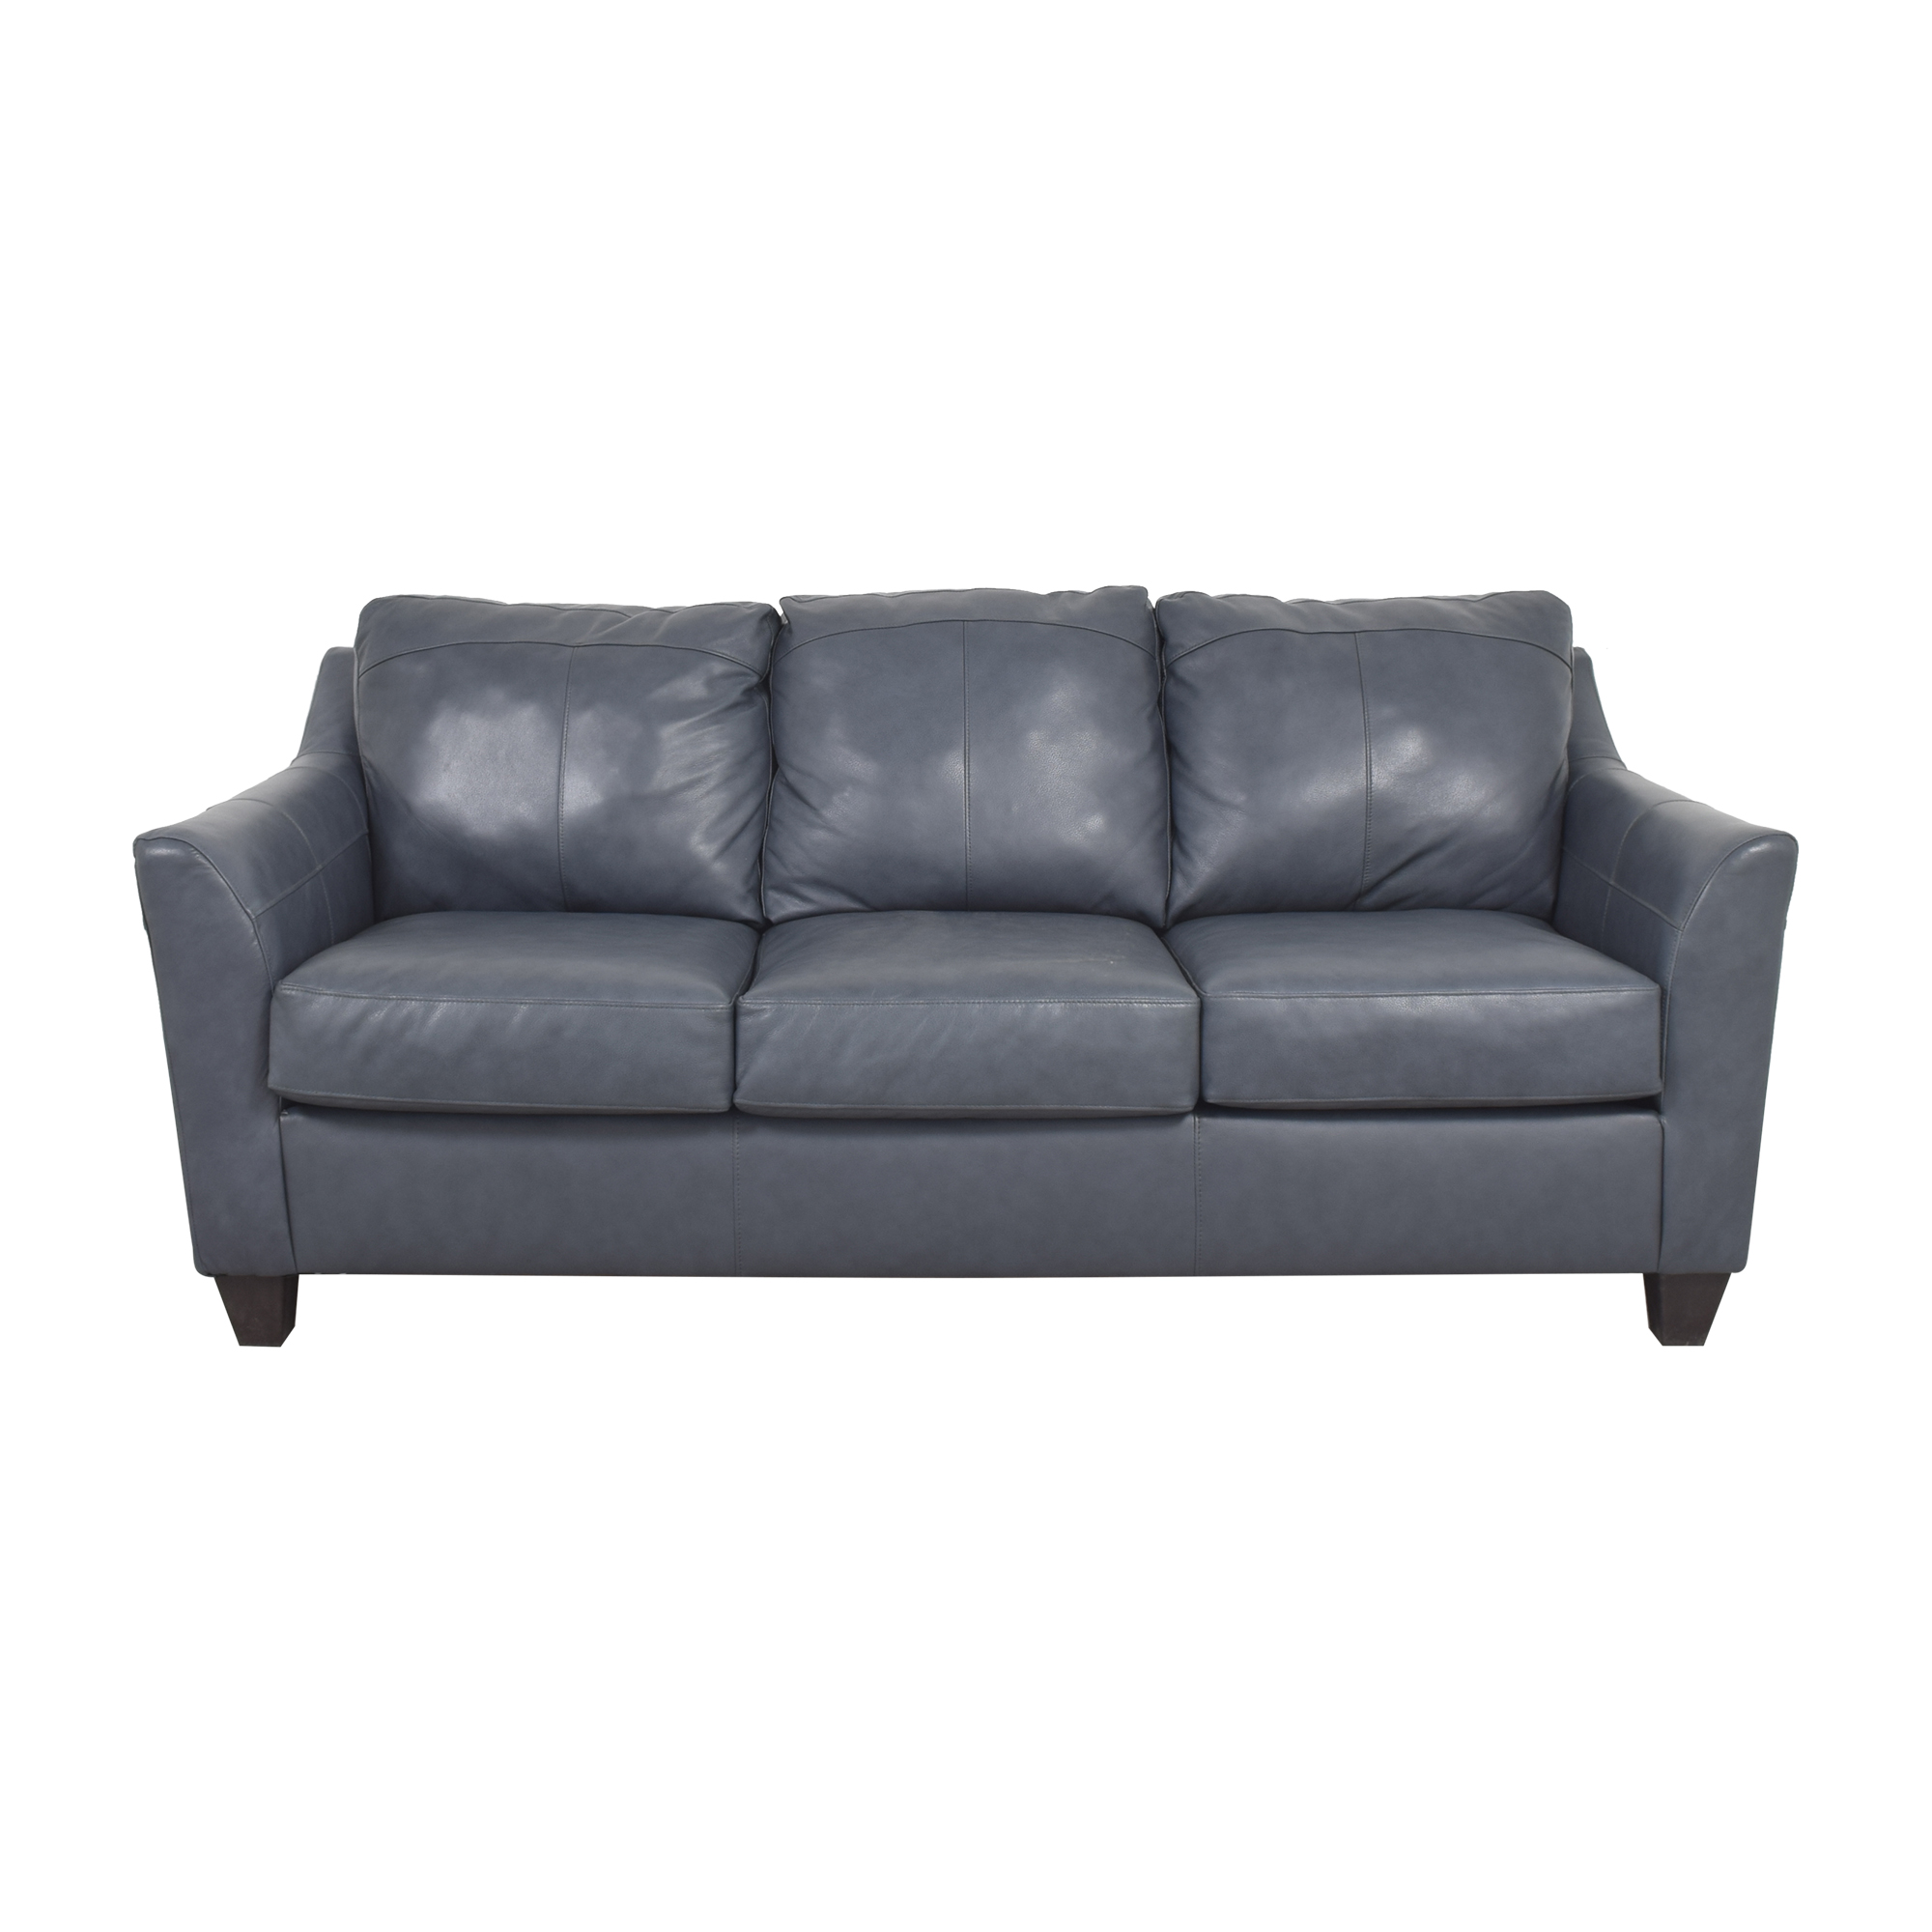 shop Raymour & Flanigan Raylen Three Cushion Sofa Raymour & Flanigan Sofas